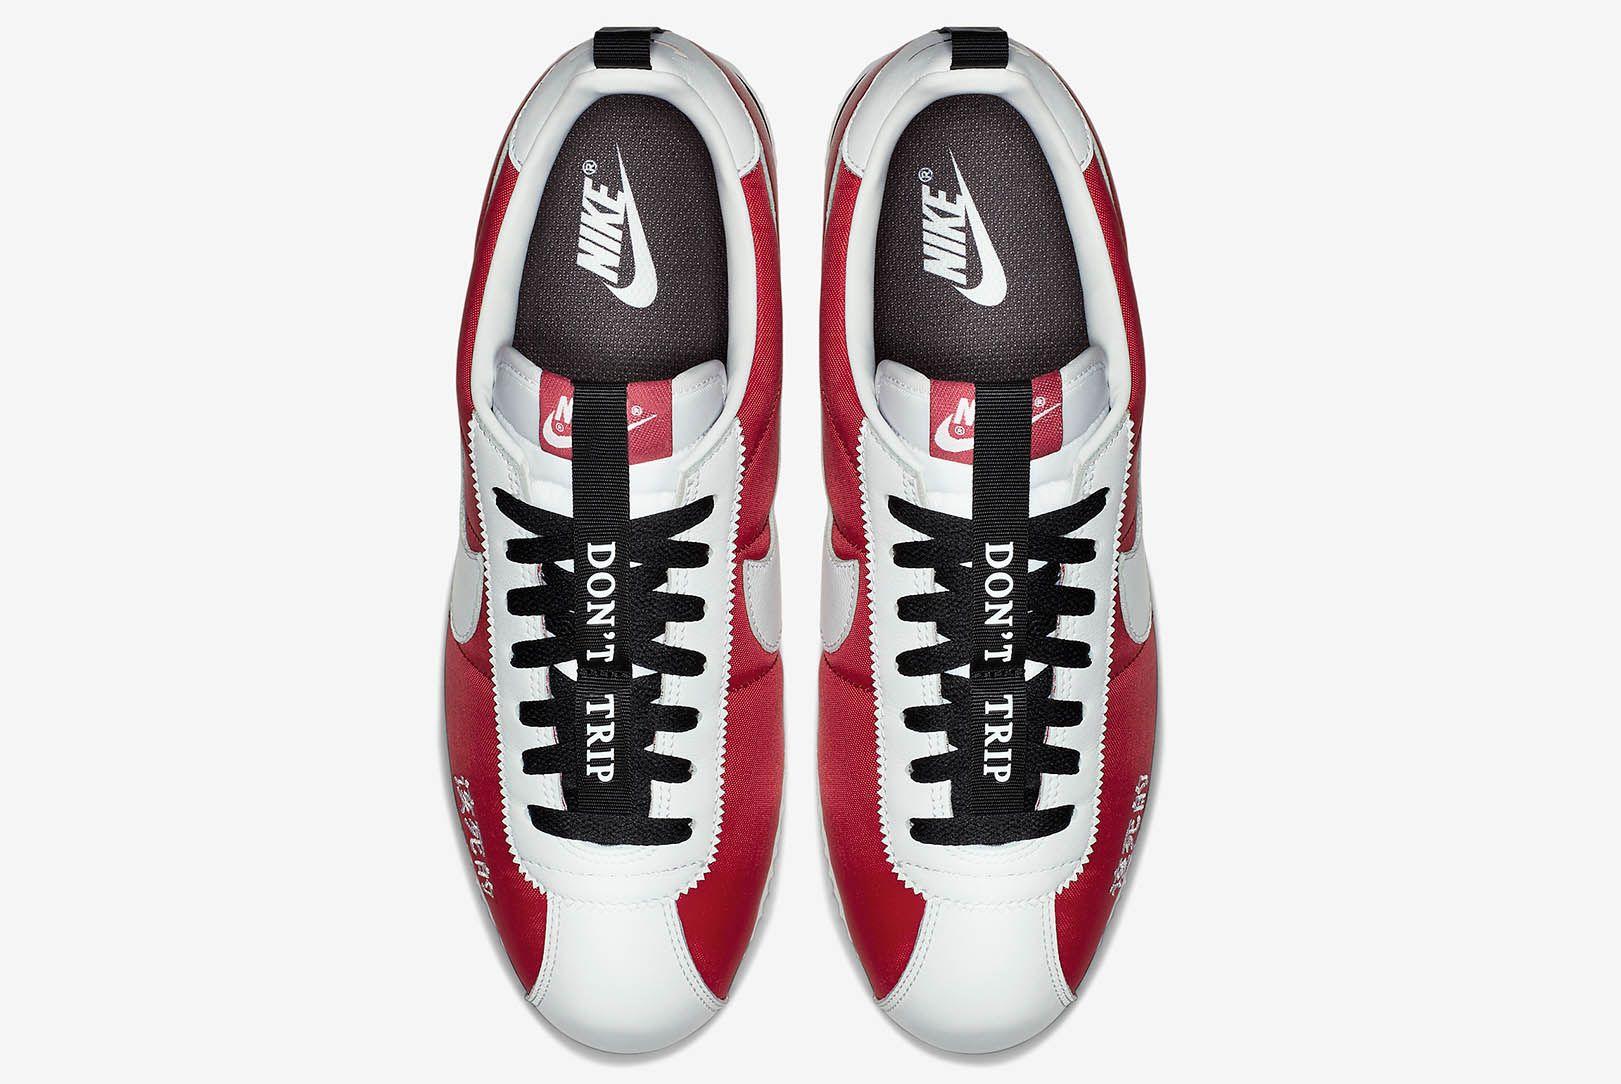 Kendrick Lamar Nike Cortez Red White Kung Fu Kenny 2